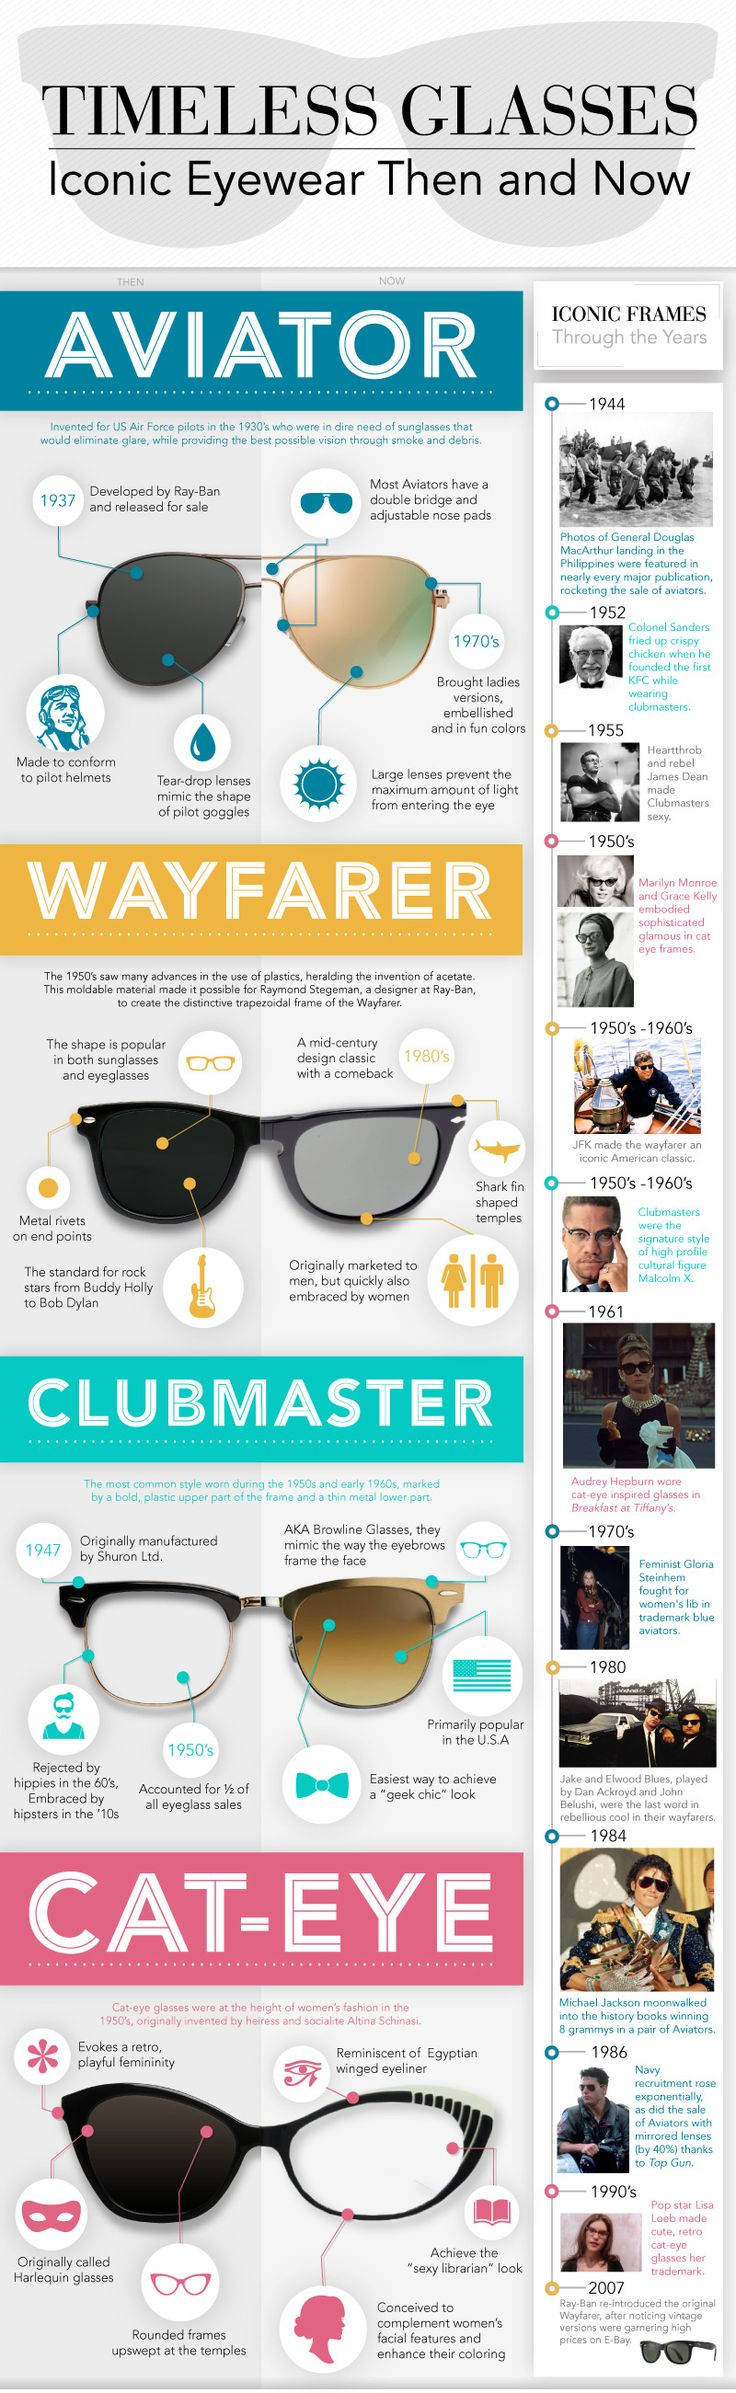 Iconic Glasses Shapes: Aviator, Wayfarer, Clubmaster & Cat-Eye http://www.framesdirect.com/landing/a/wayfarer-aviator-clubmaster-infographic.html